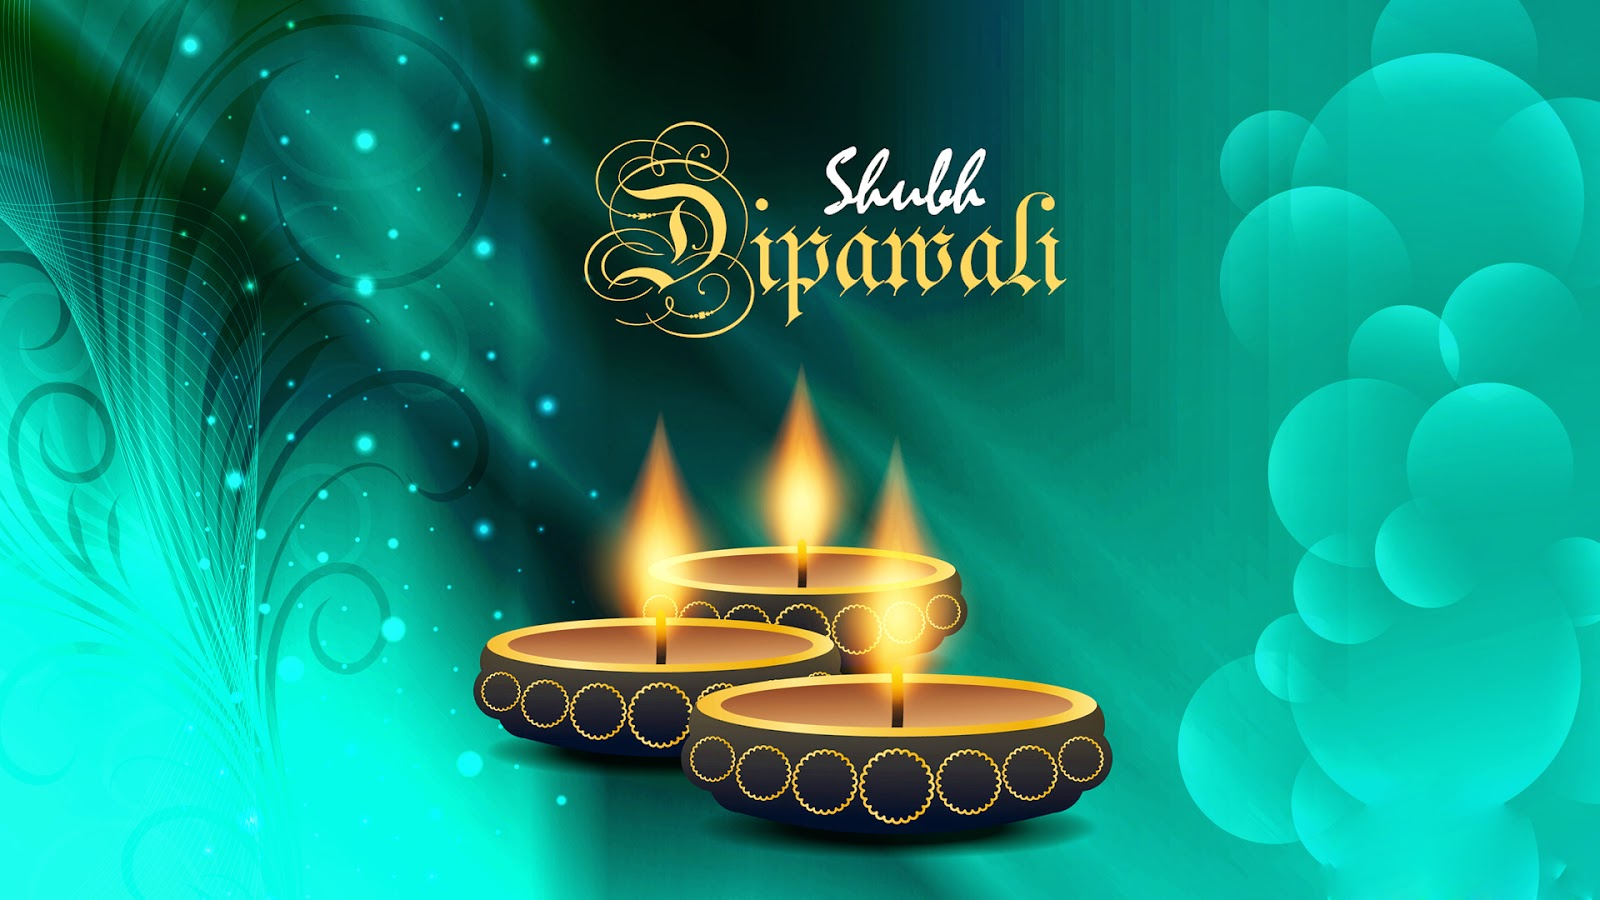 Choti Diwali HD Wallpapers